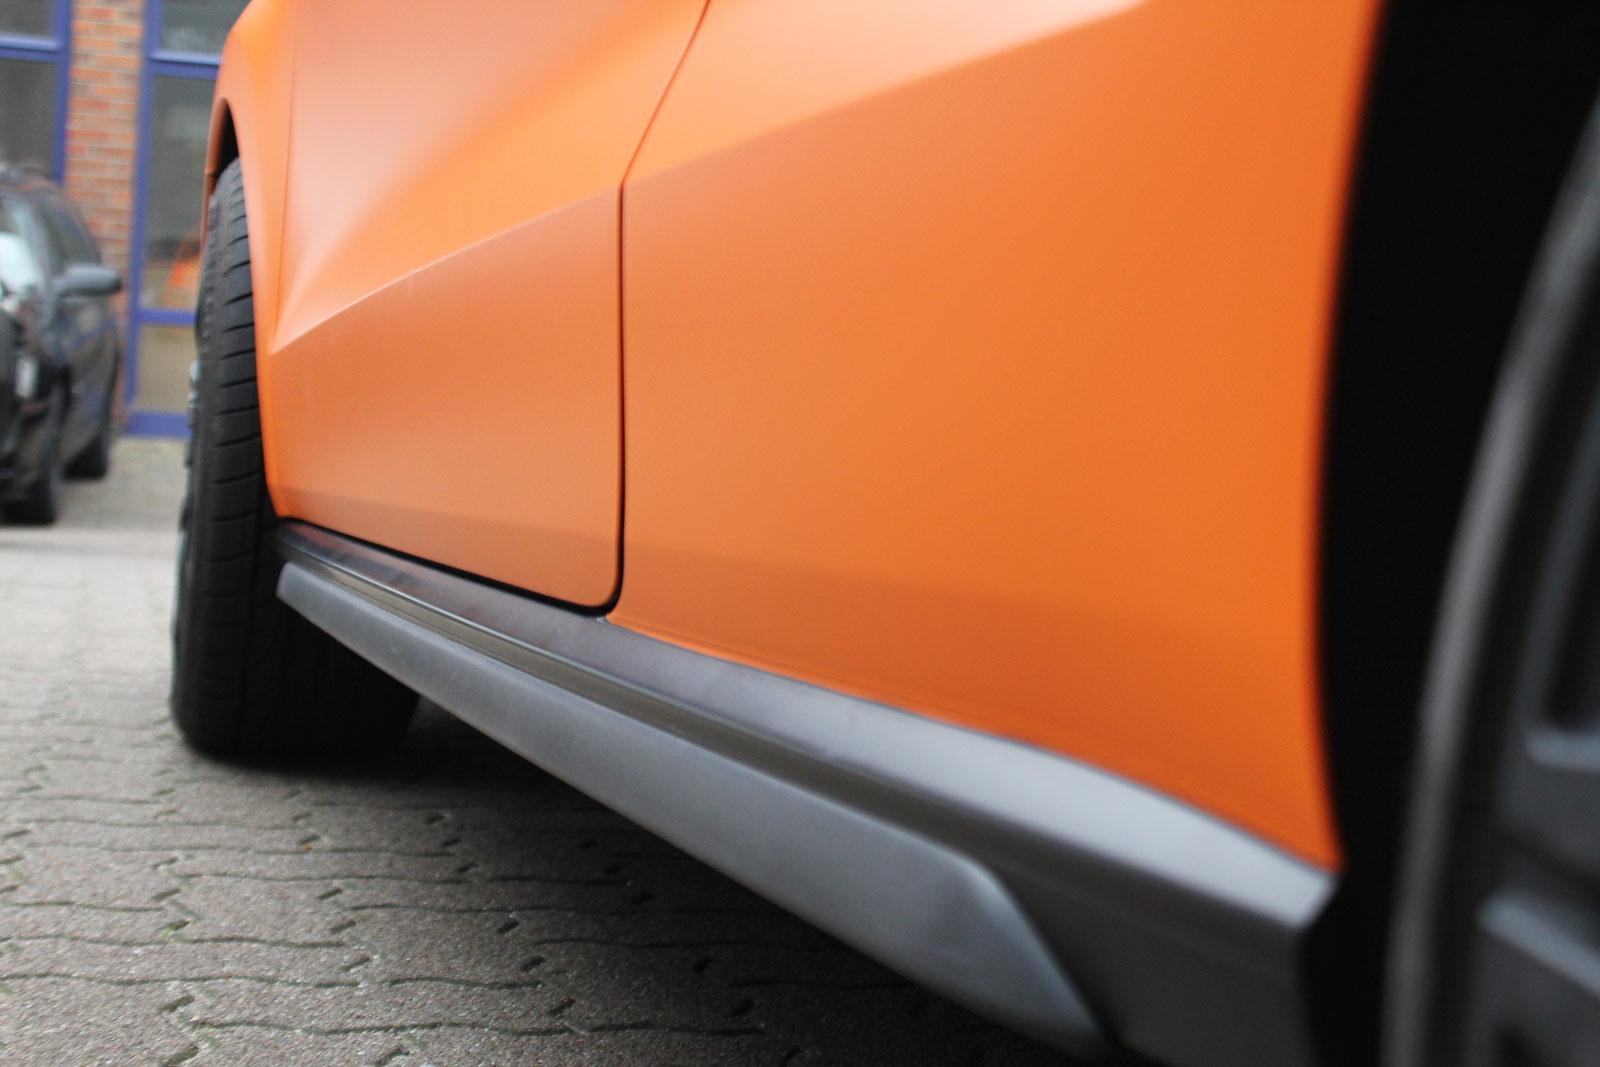 VW_Polo_GTI_Folierung_Orange_Matt_19